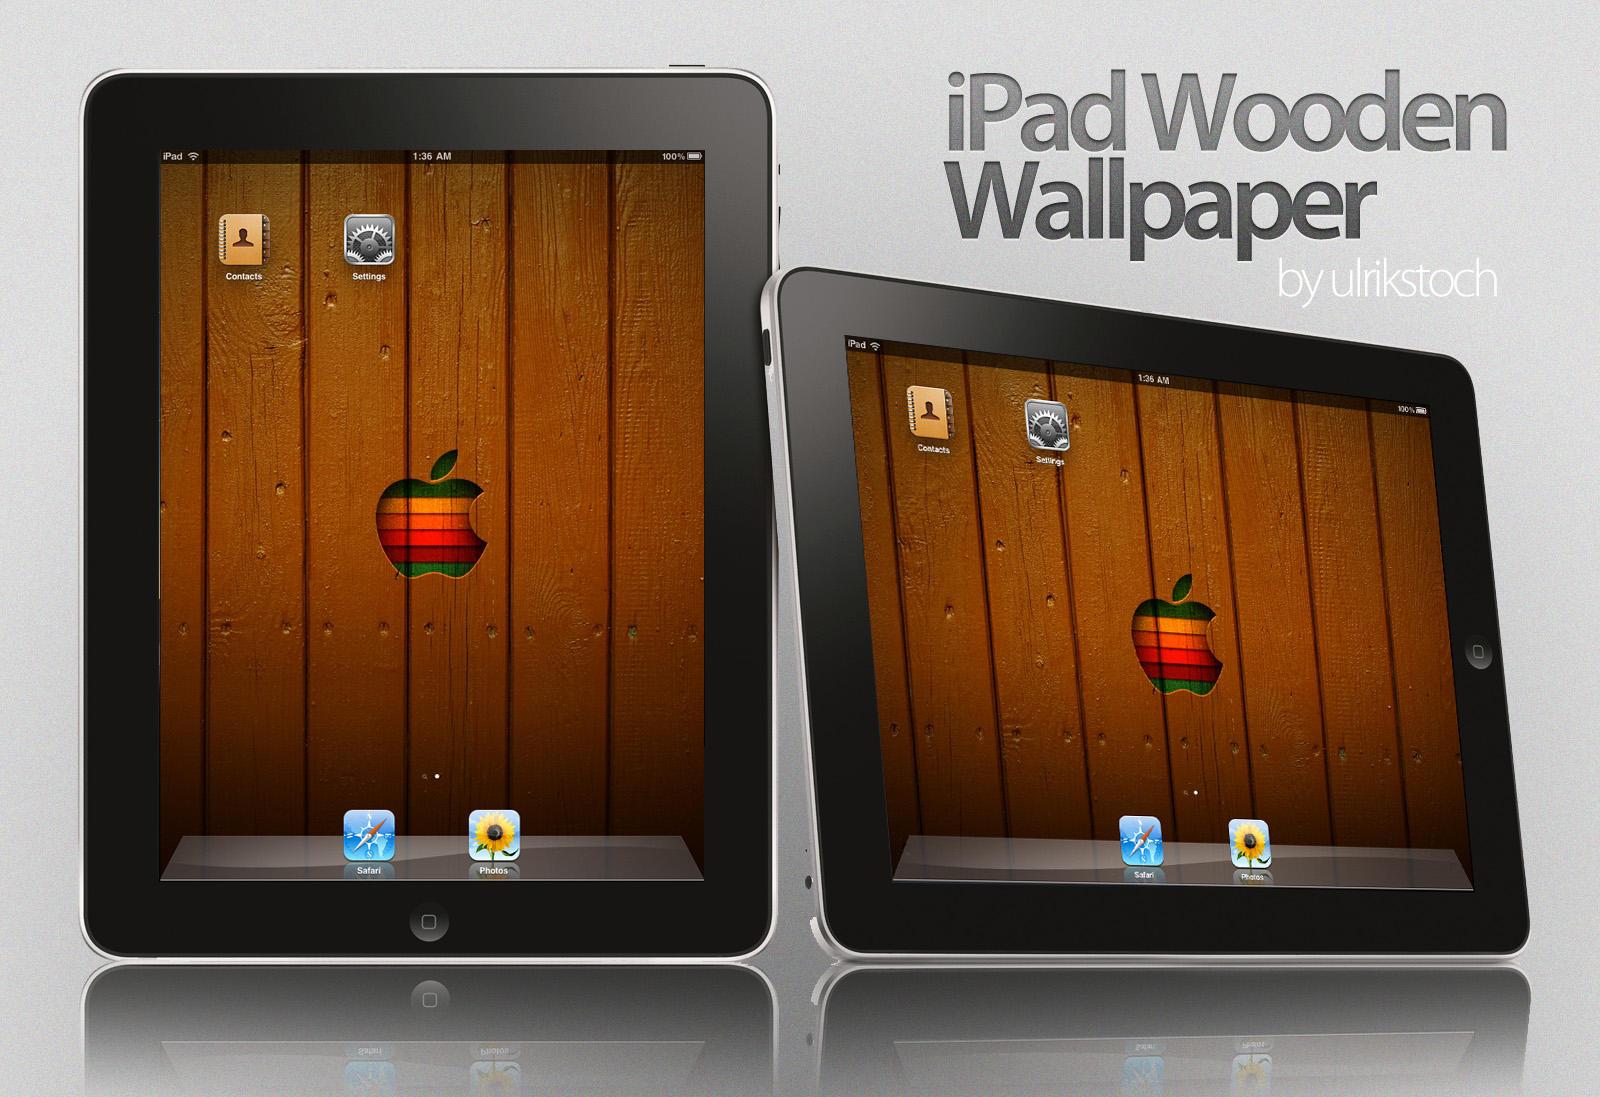 iPad Wooden Wallpaper by ulrikstoch